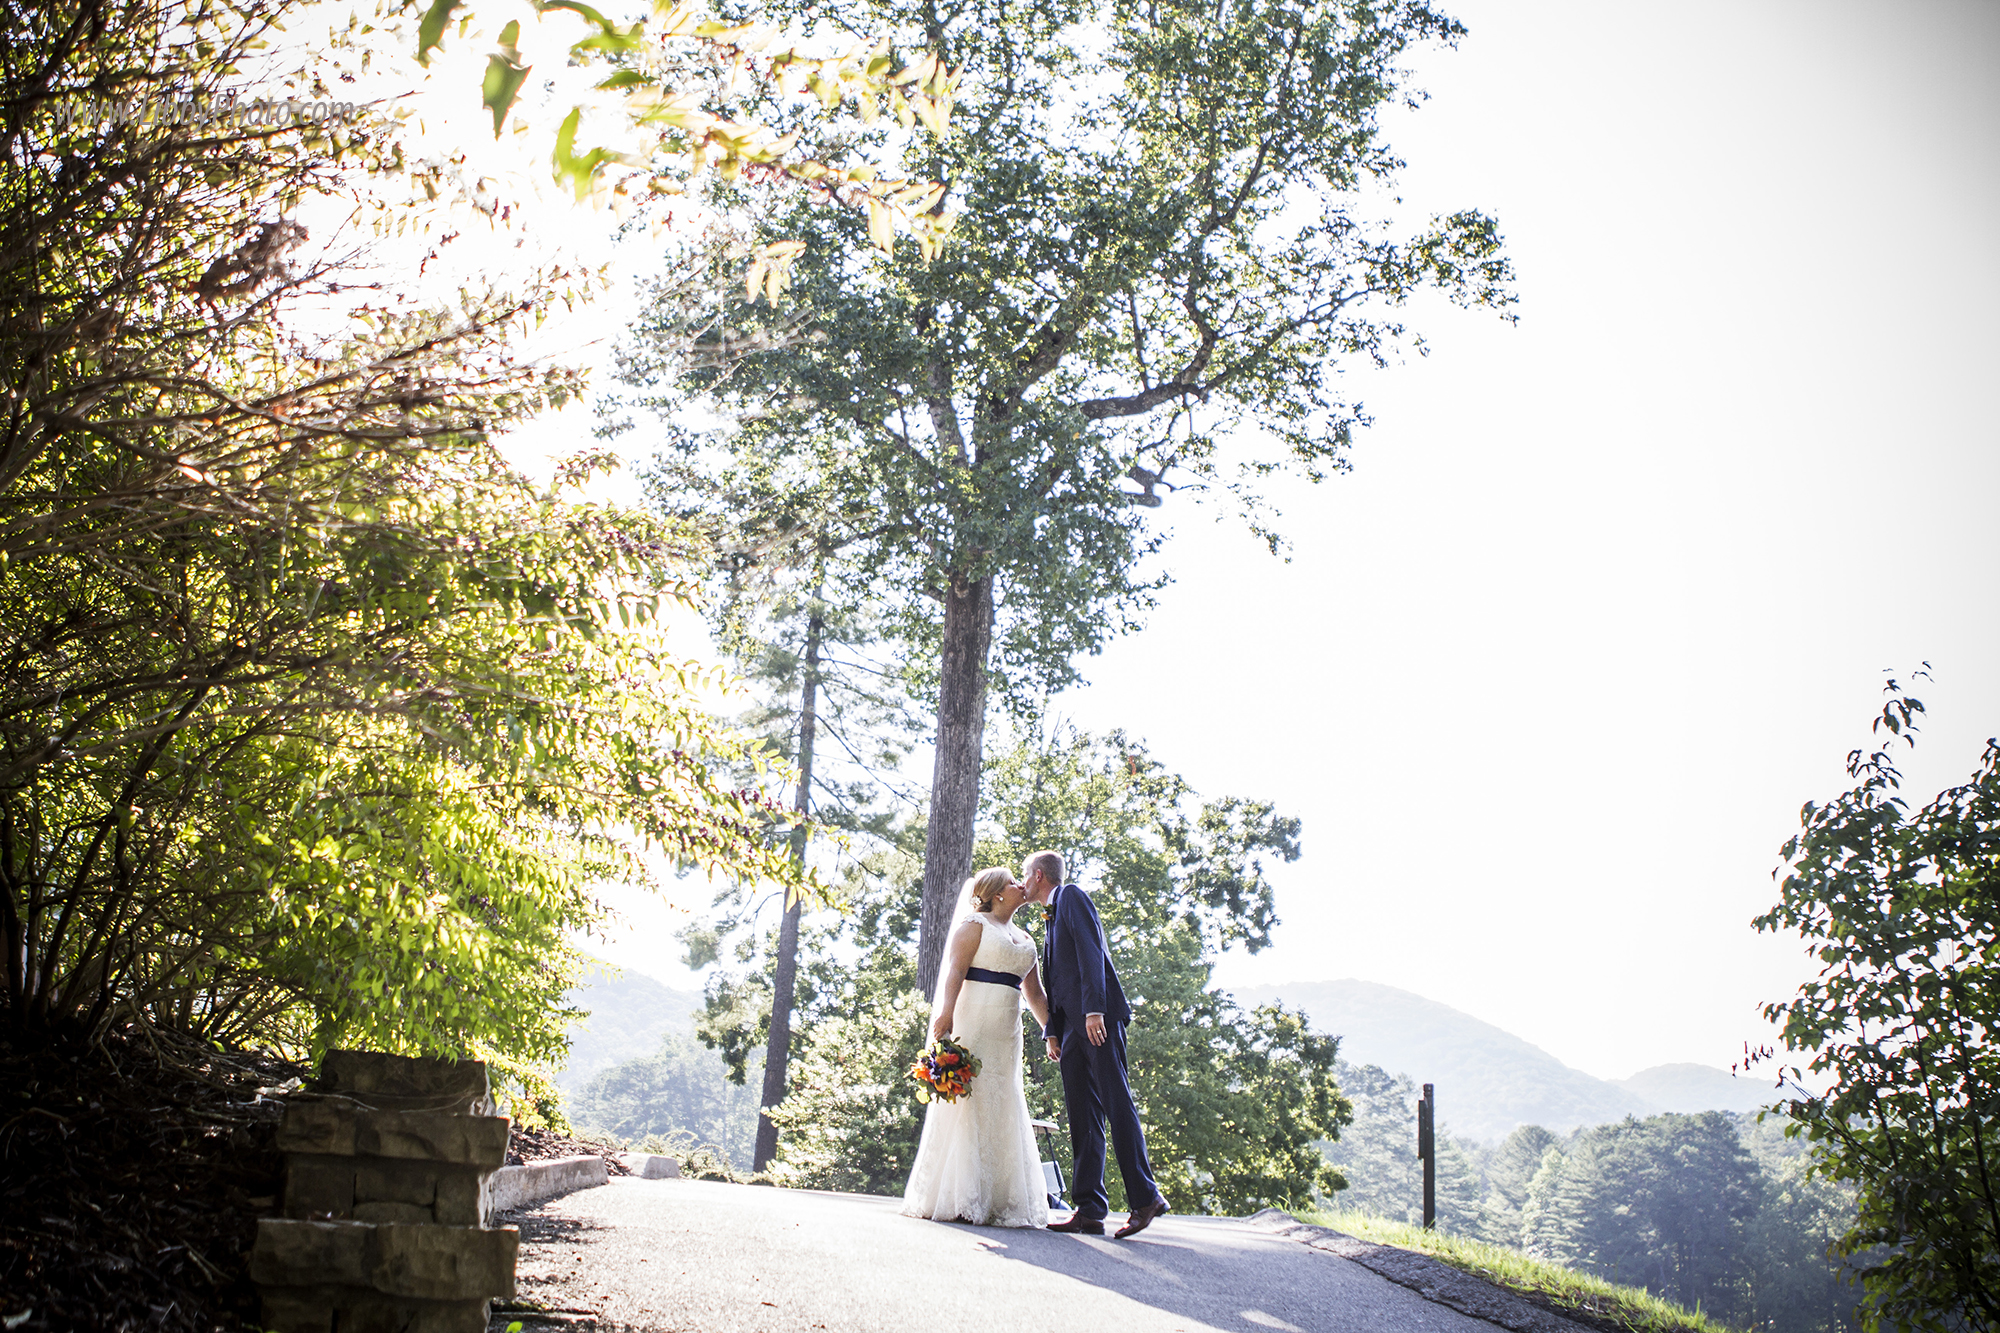 Atlanta wedding photography, Libbyphoto11 (17).jpg